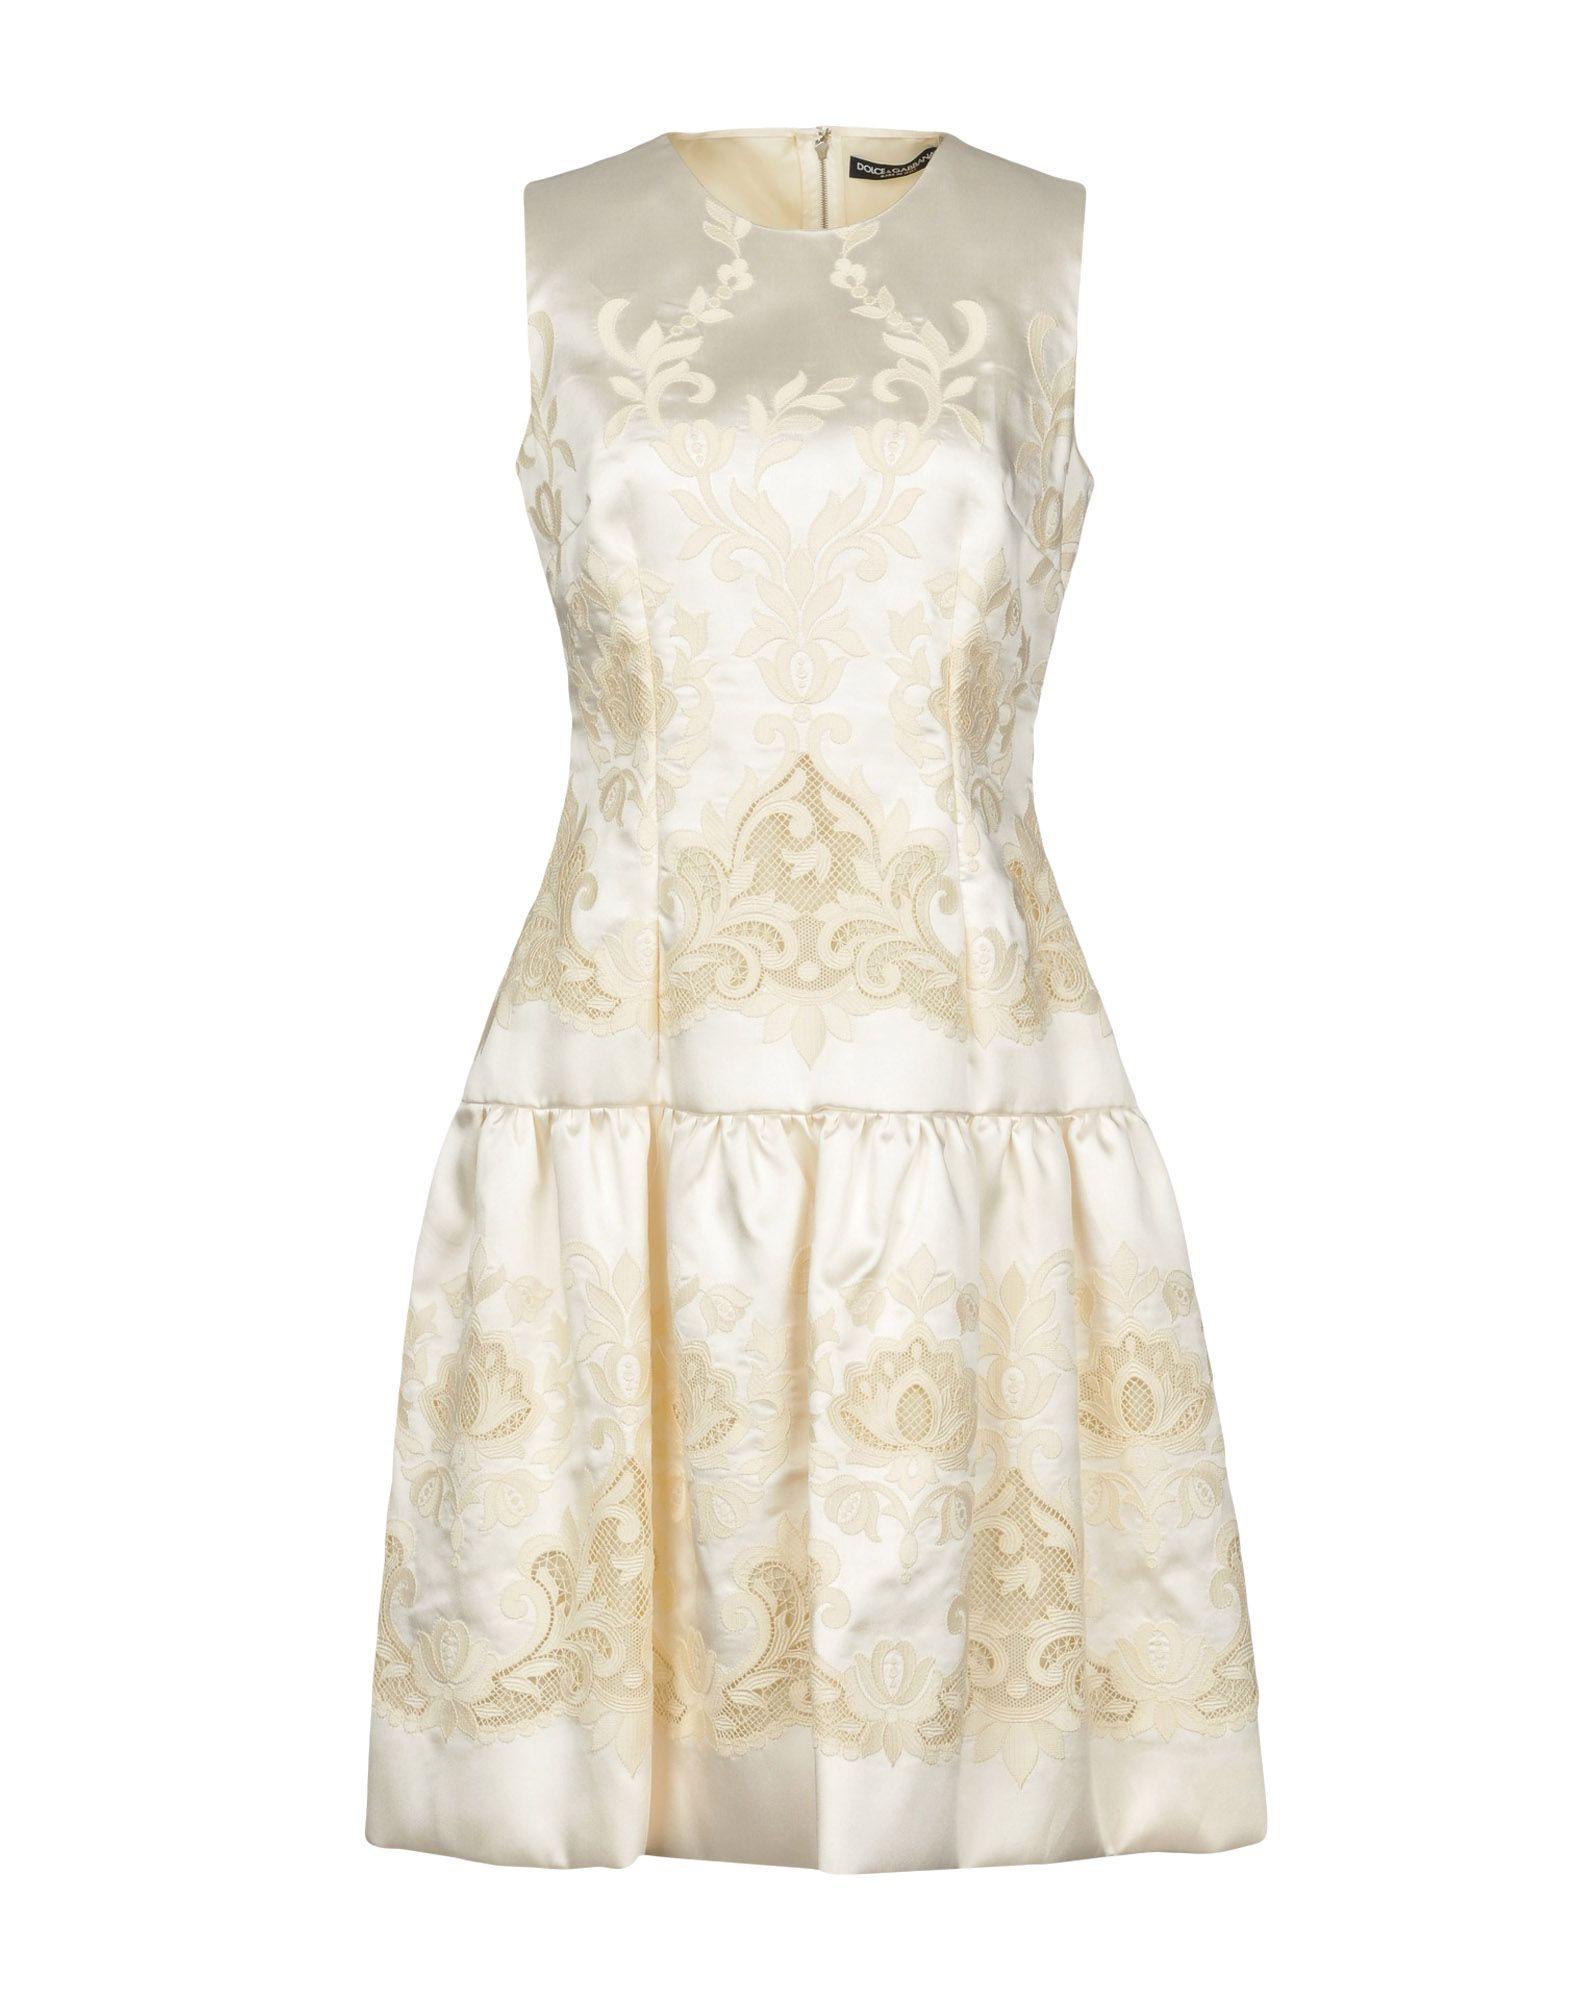 Luxus Abendkleid Yoox Boutique10 Genial Abendkleid Yoox Stylish